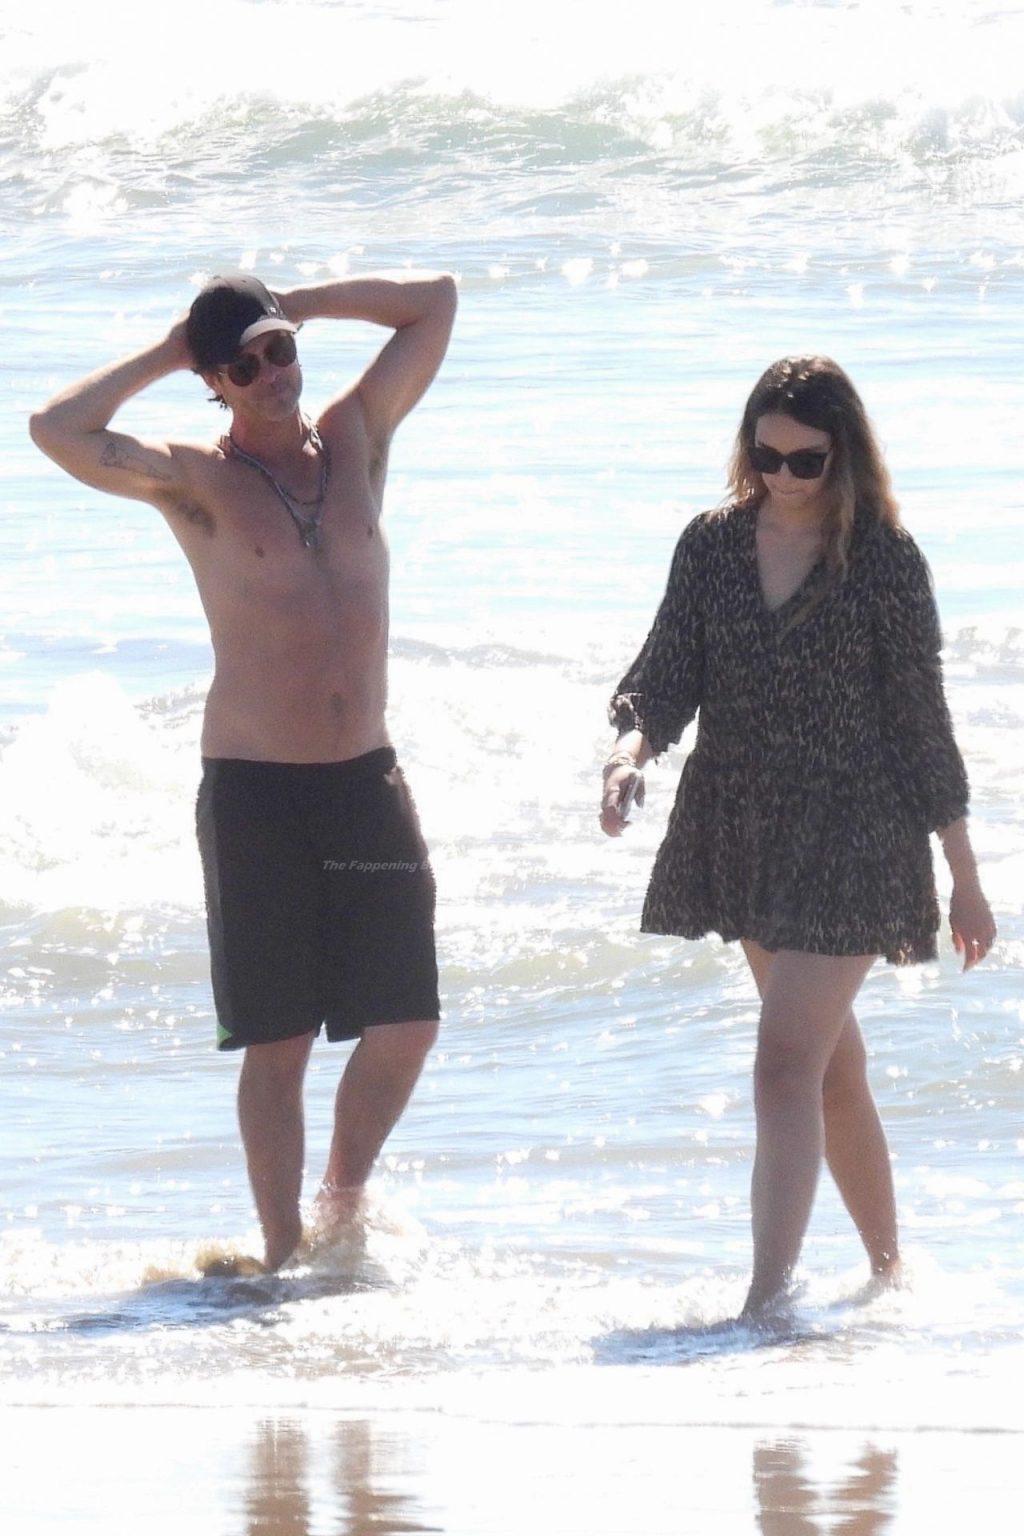 April Love Geary & Robin Thicke Enjoy a Fun Beach Day in Malibu (97 Photos)